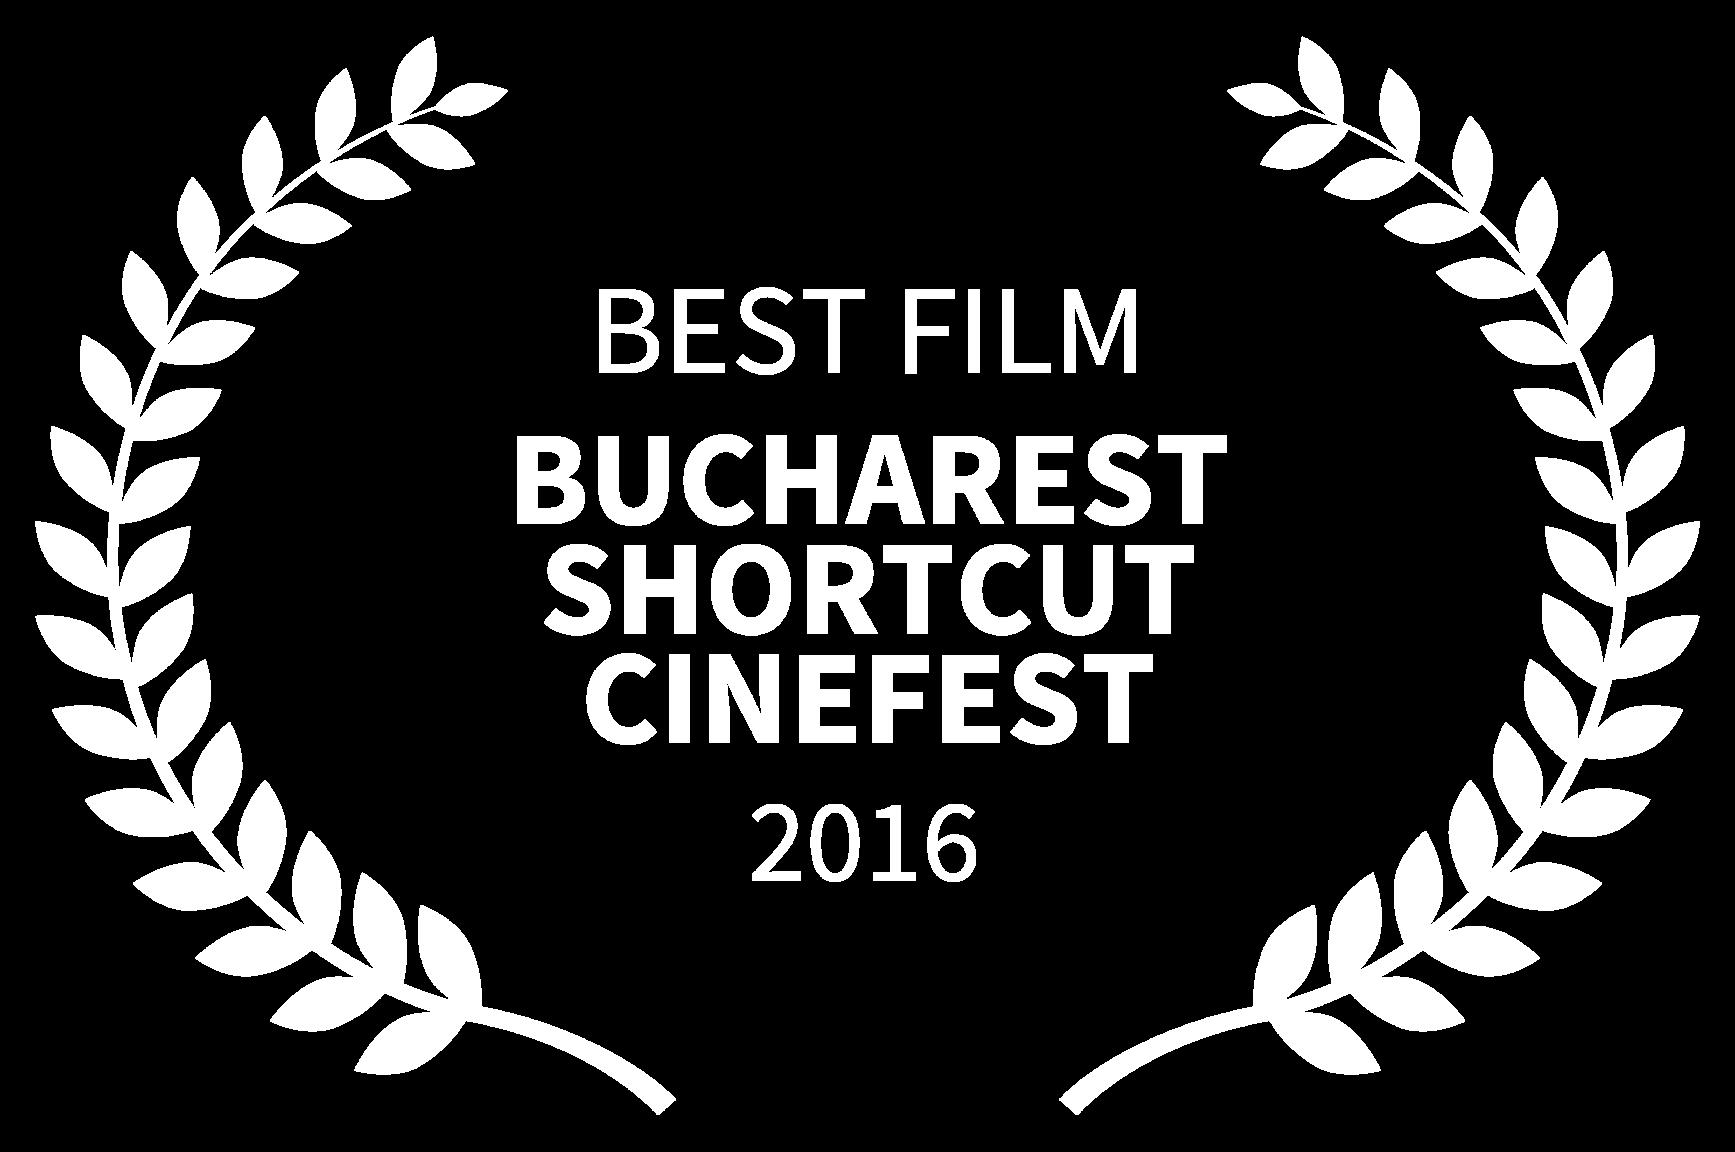 BEST FILM - BUCHAREST SHORTCUT CINEFEST - 2016